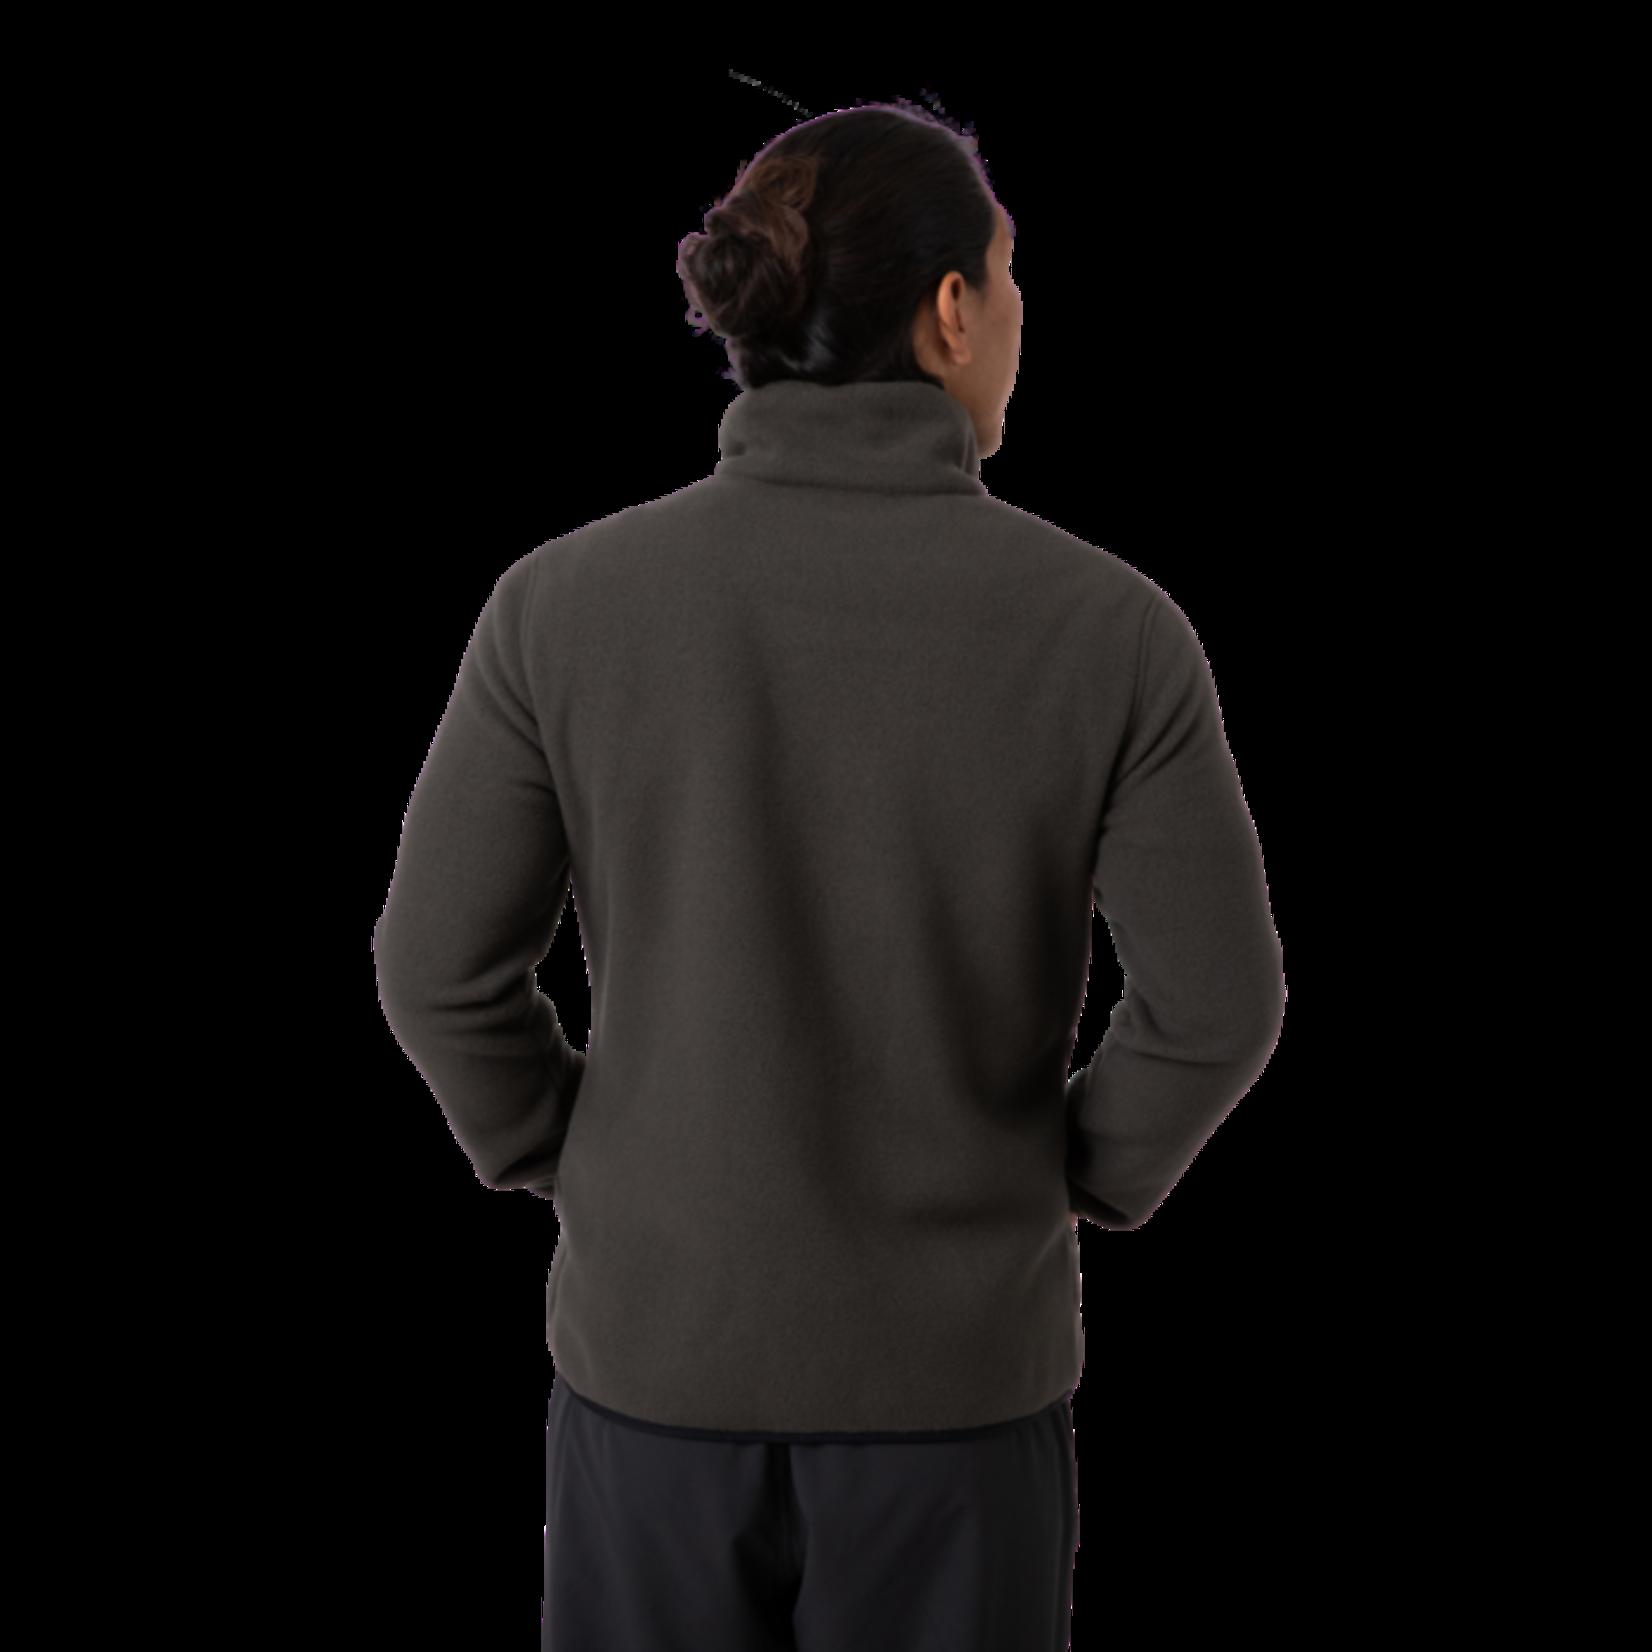 Cotopaxi Cotopaxi Teca Fleece Full Zip Jacket